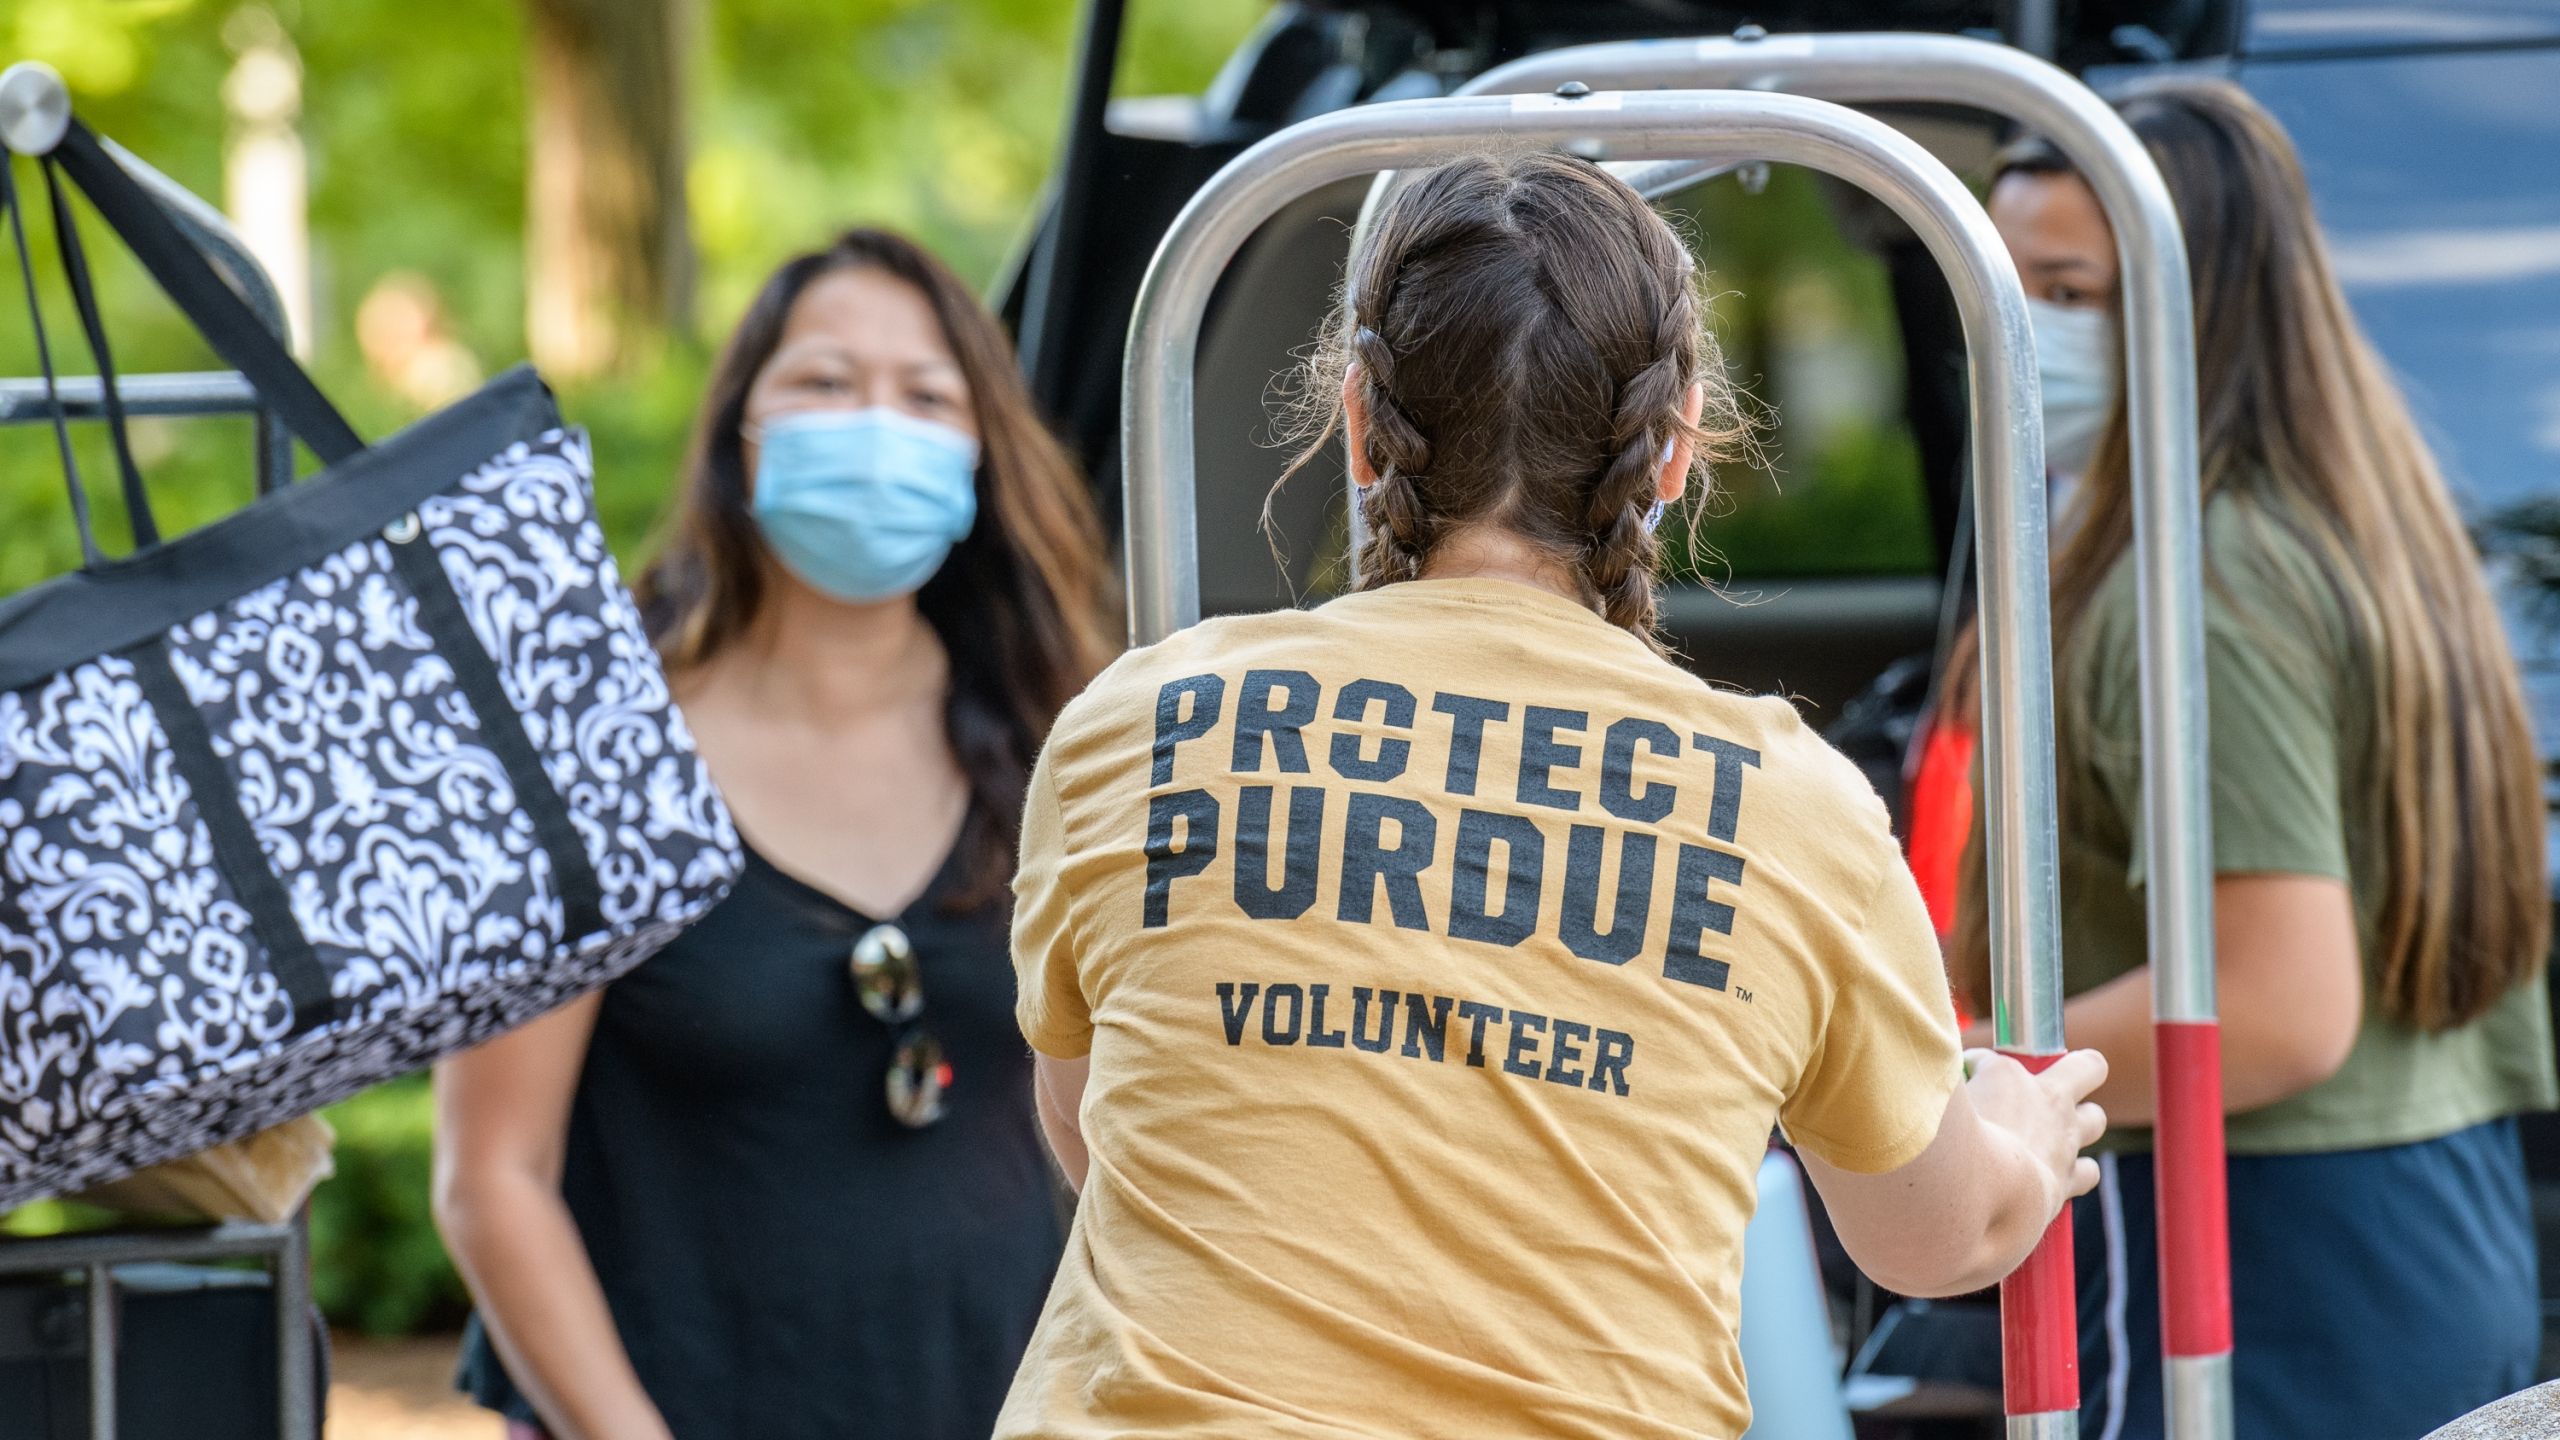 Purdue students